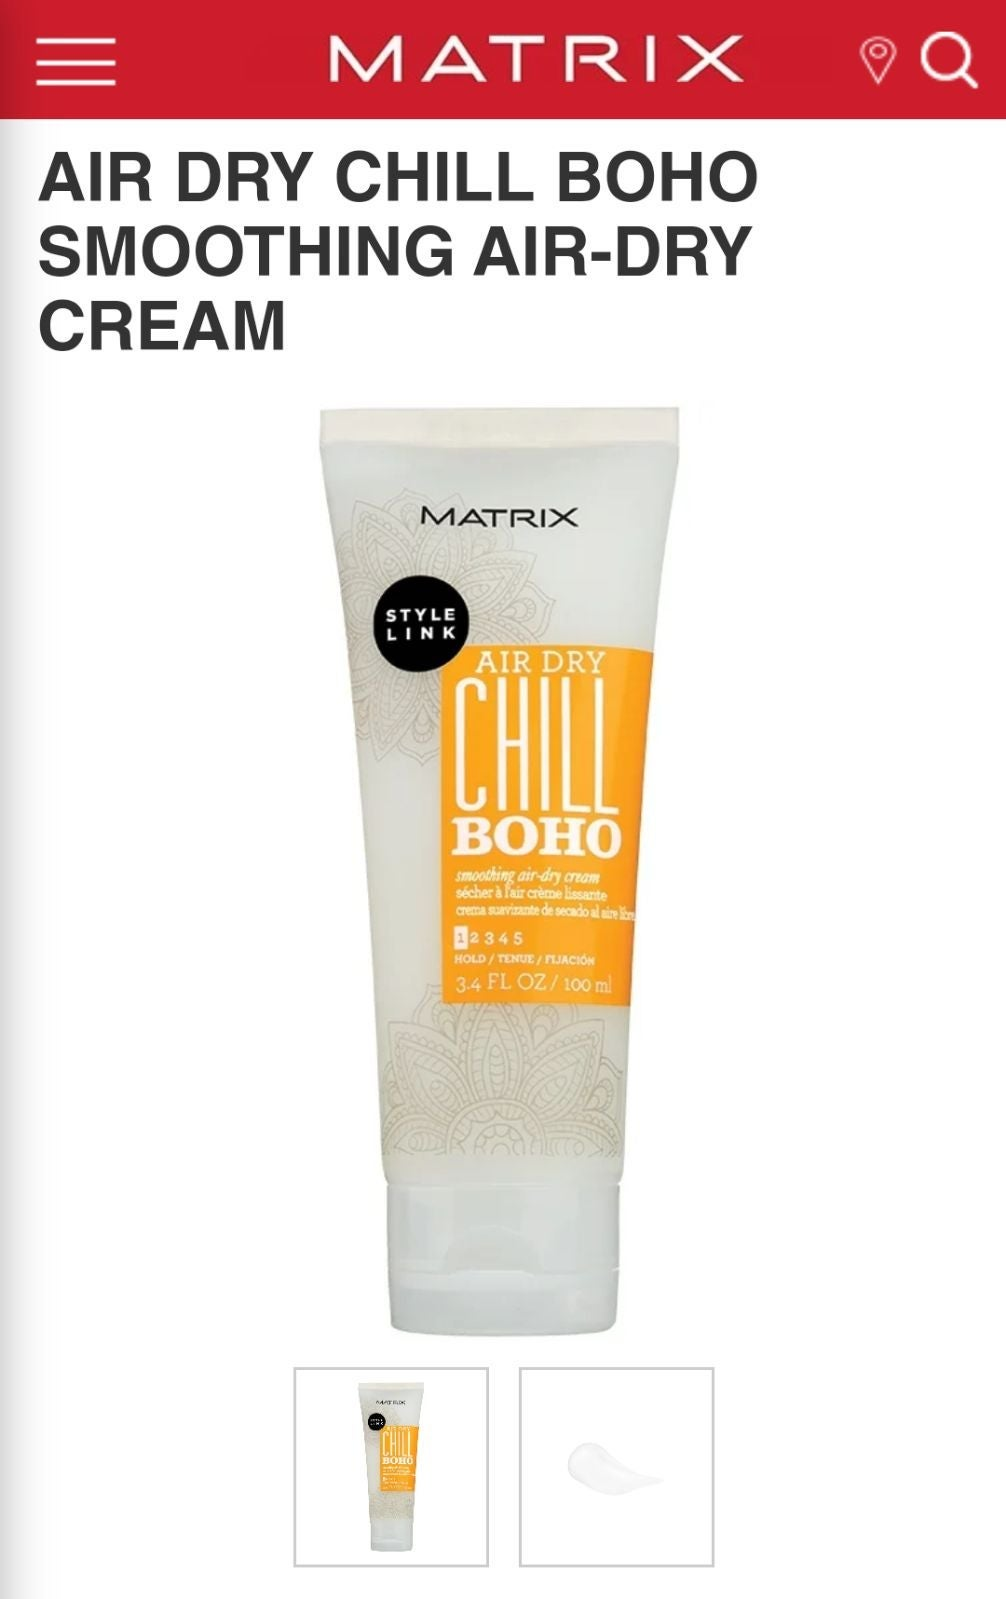 Matrix Chill Boho smoothing air dry crea